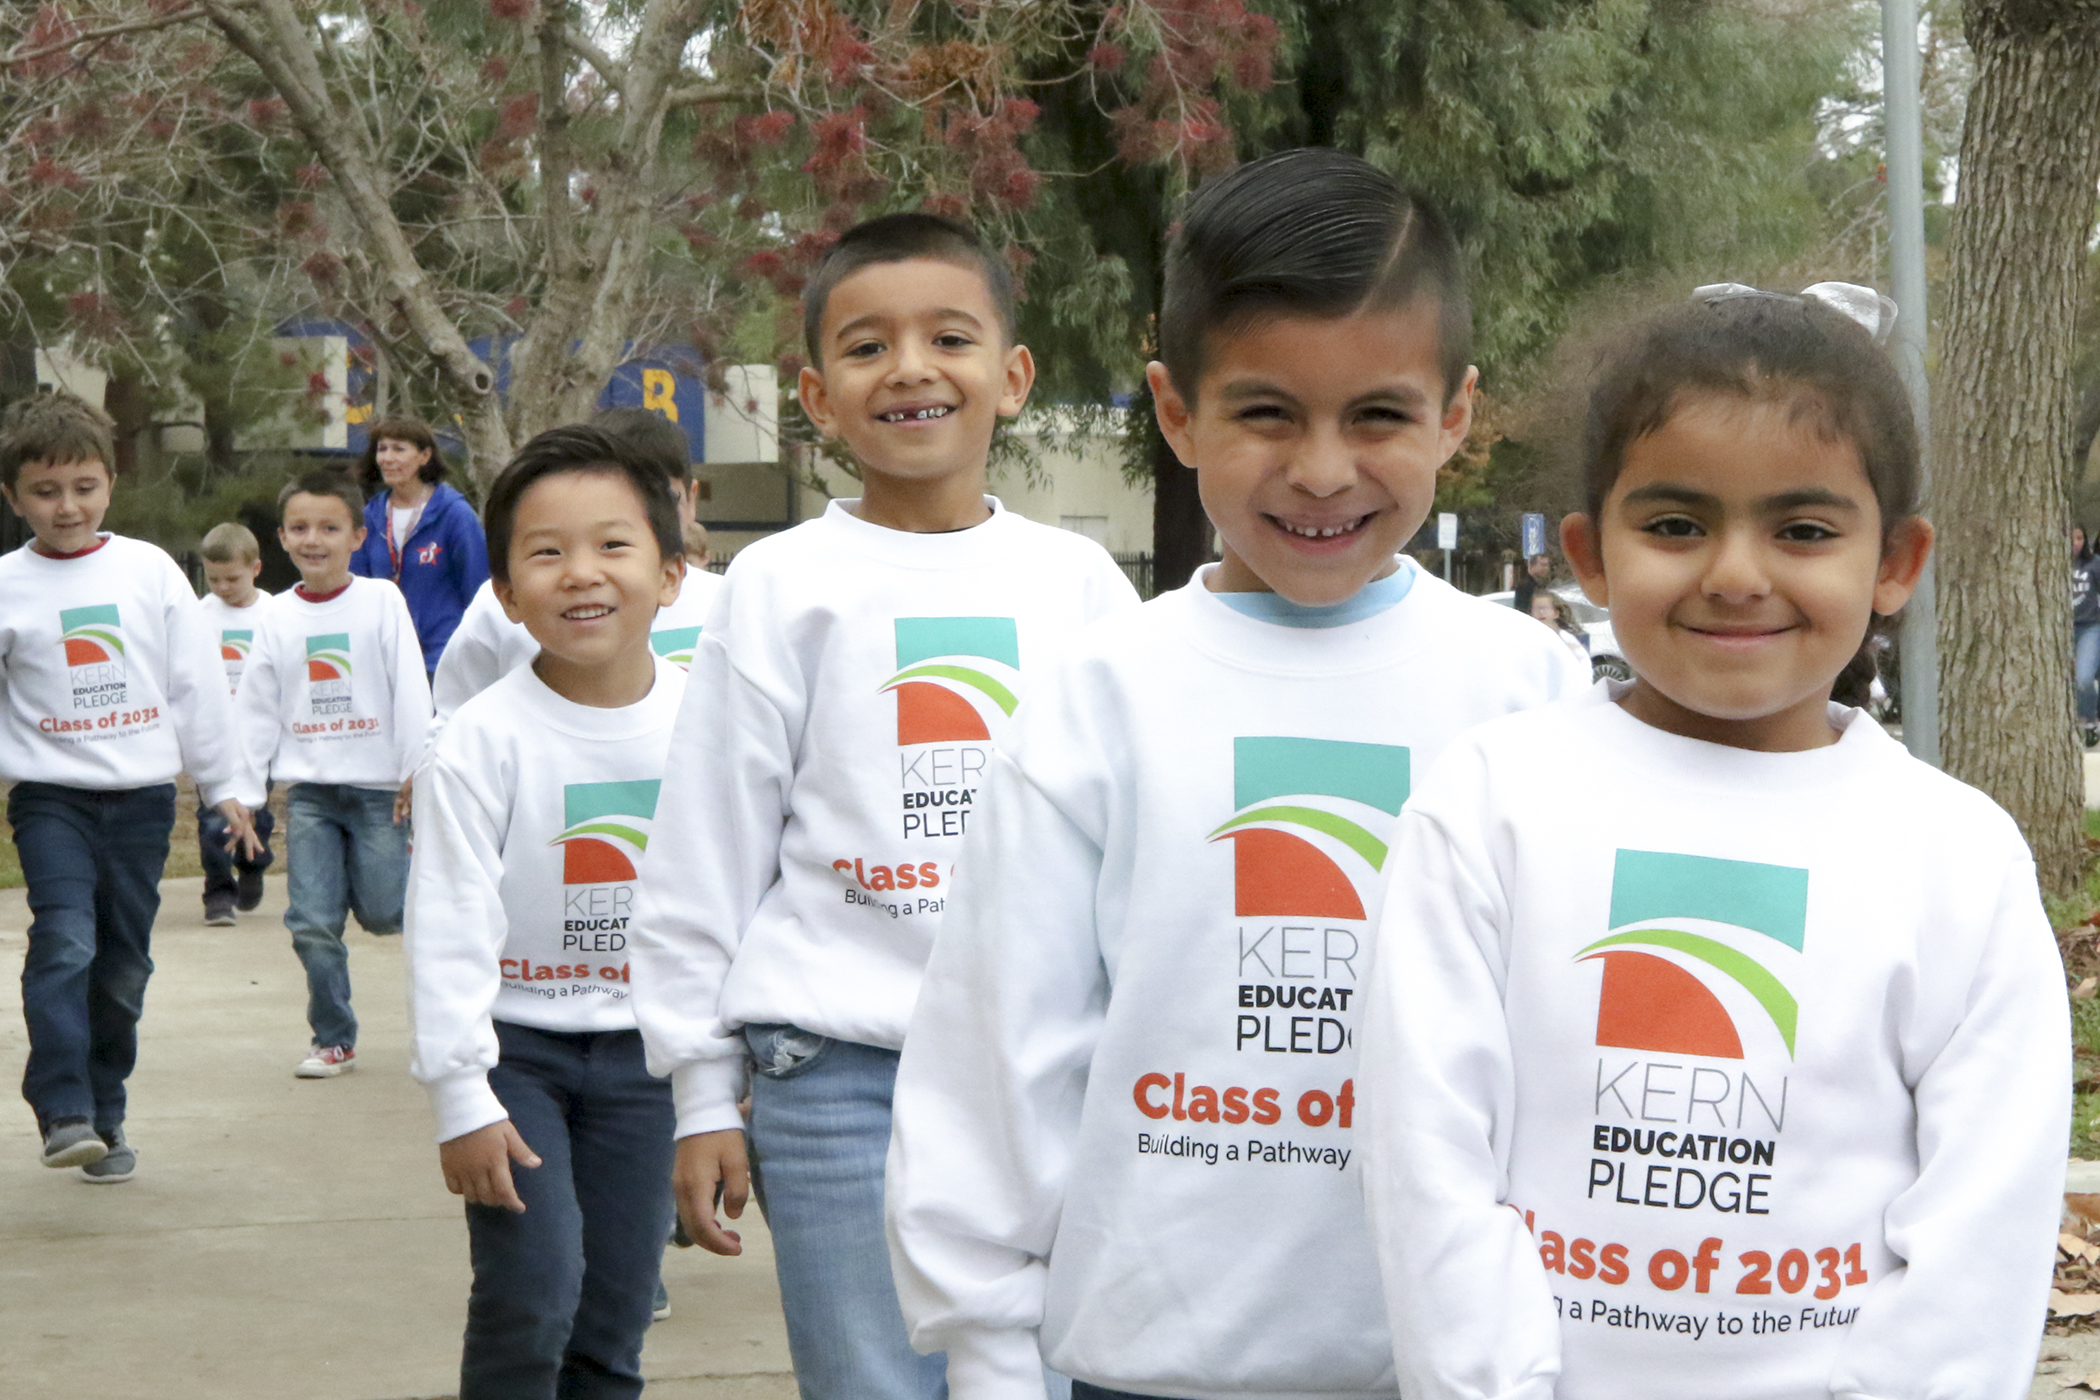 County leaders launch Kern Education Pledge